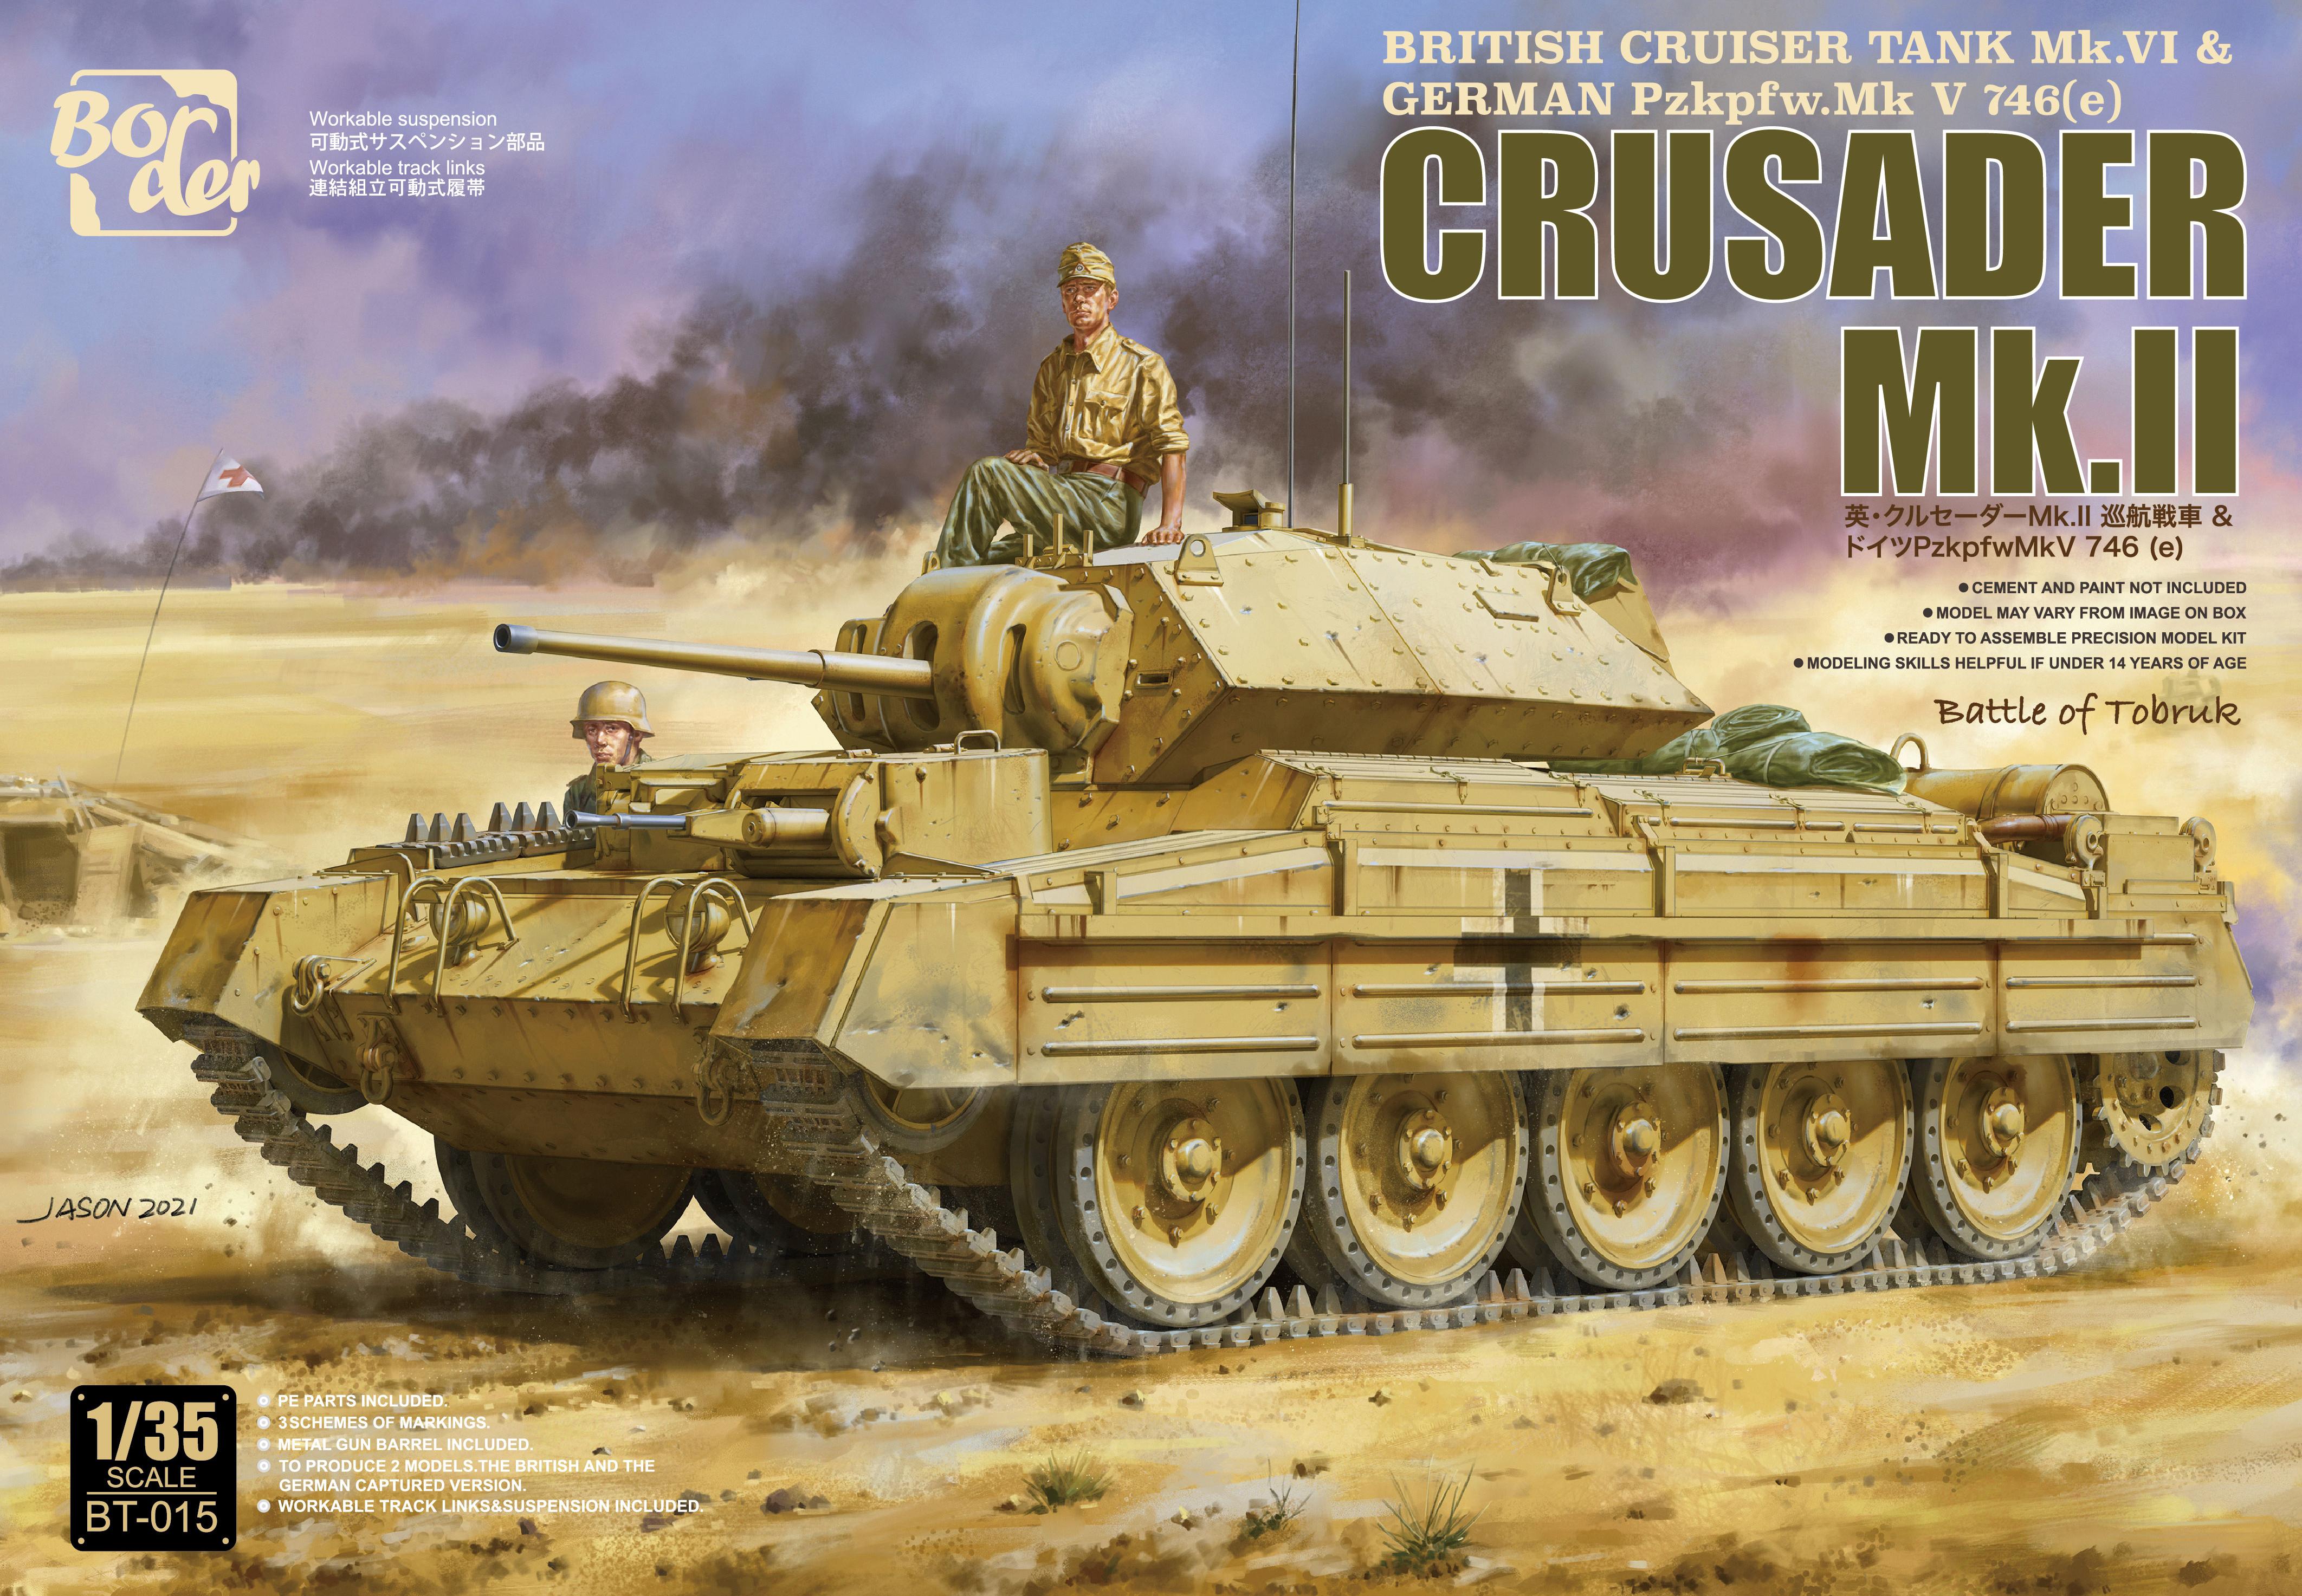 Border Model 1/35 British Cruiser Tank Mk.VI & GERMANY Pzkpfw.Mk V 746(e) Crusader Mk.II